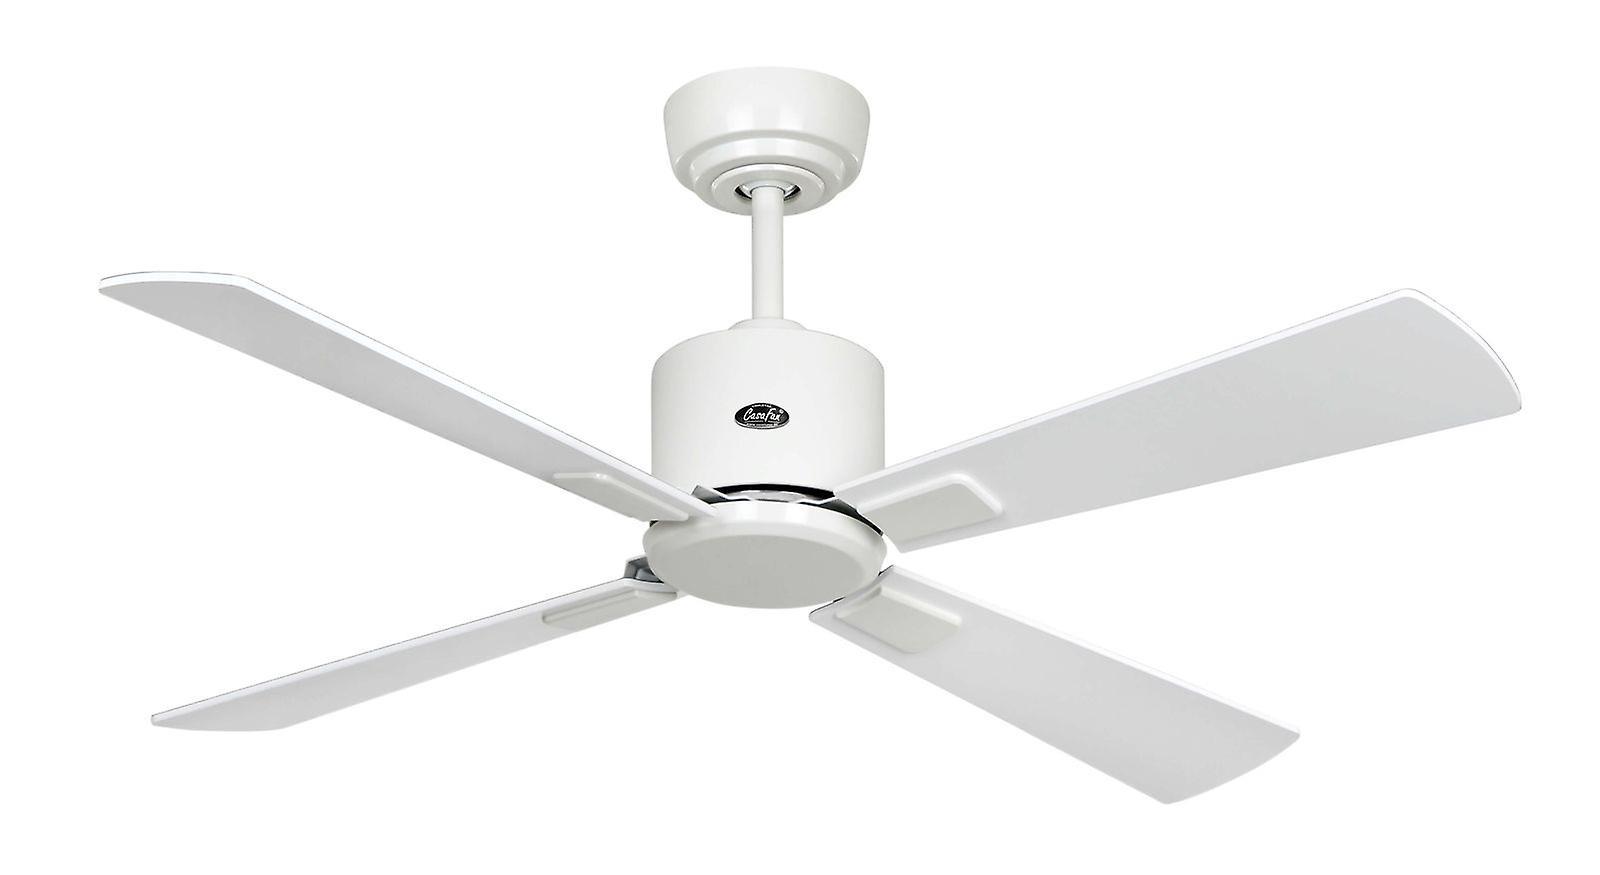 Ceiling Fan ECO NEO III 103 WH blanc   Light gris